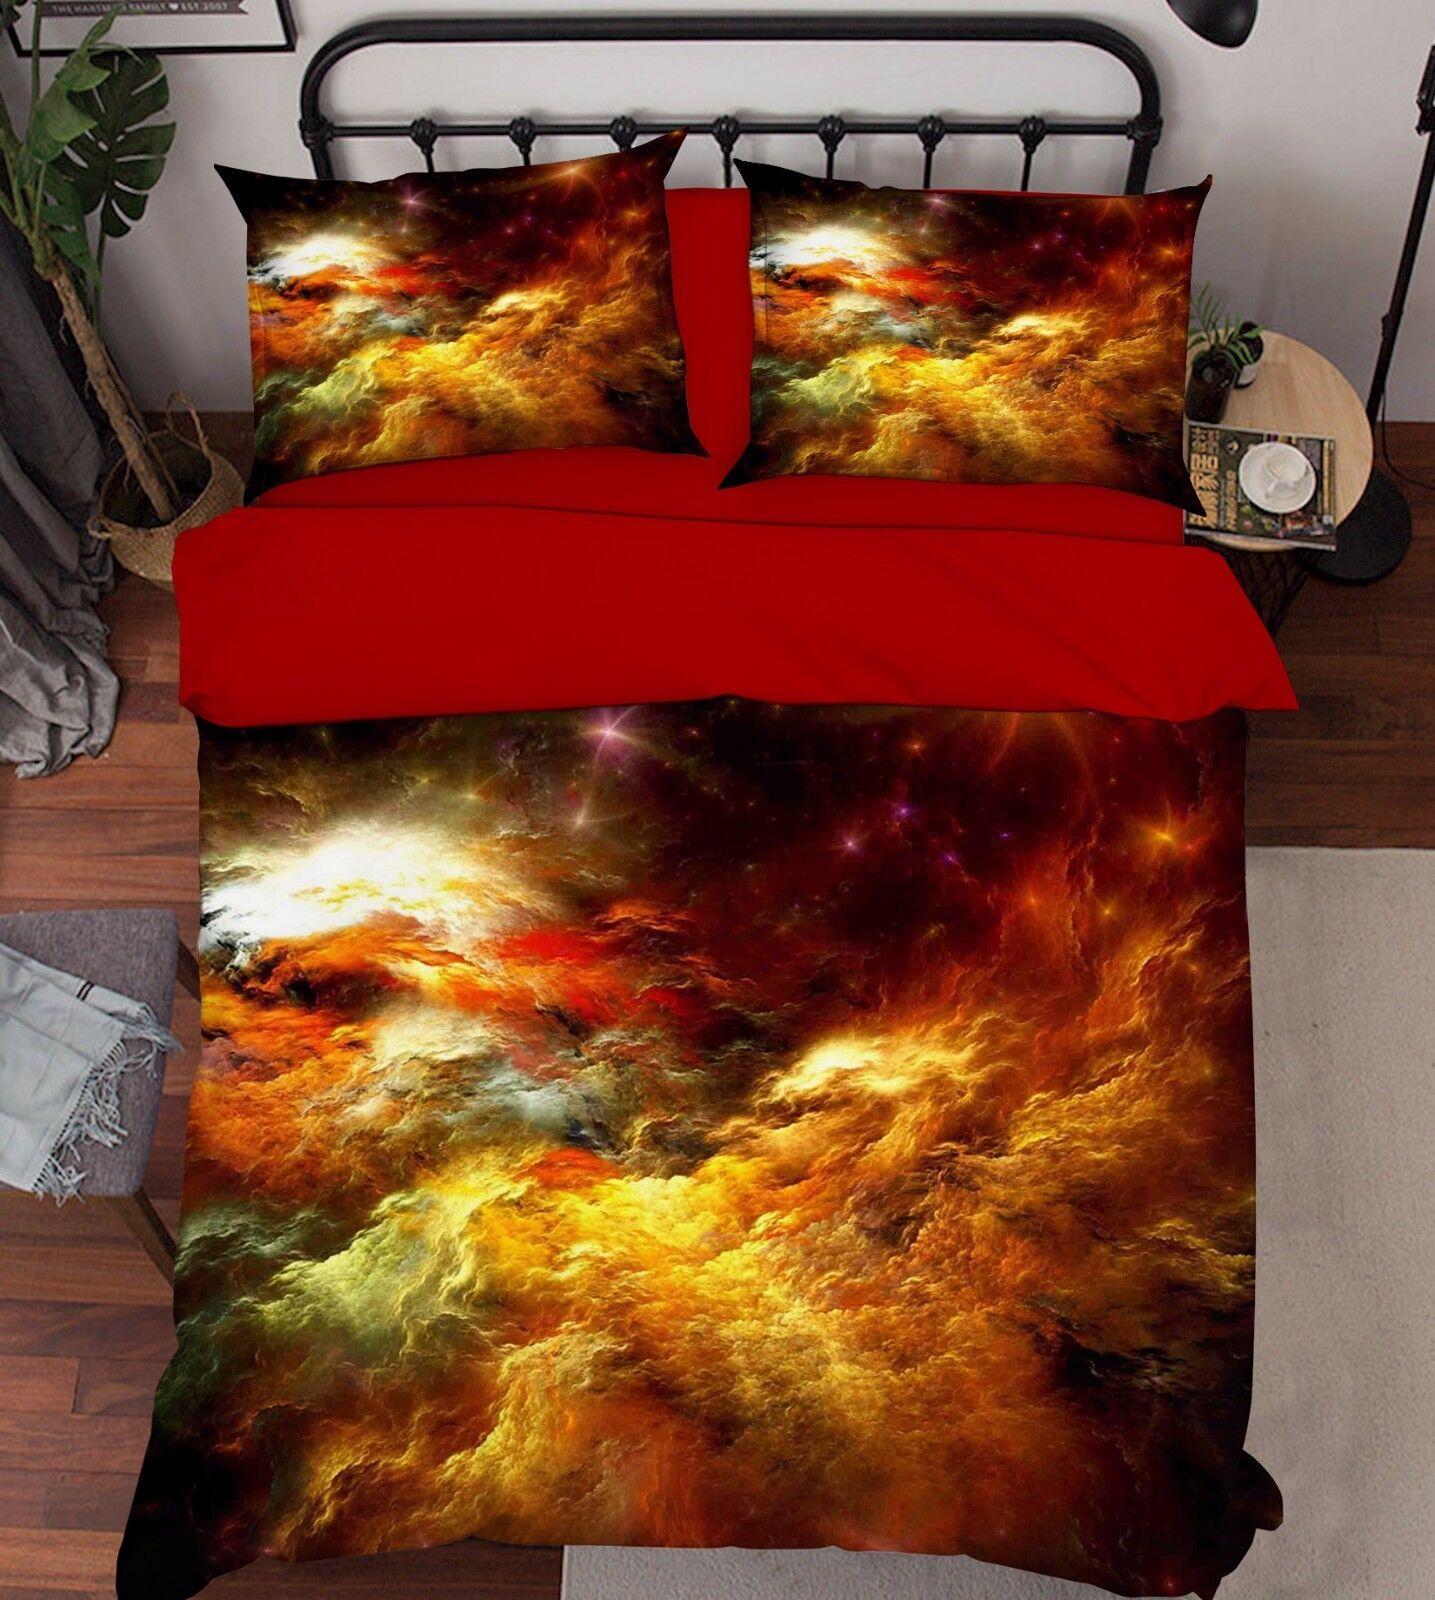 3D Farbe Clouds Bed Pillowcases Quilt Duvet Cover Set Single Queen King Größe AU